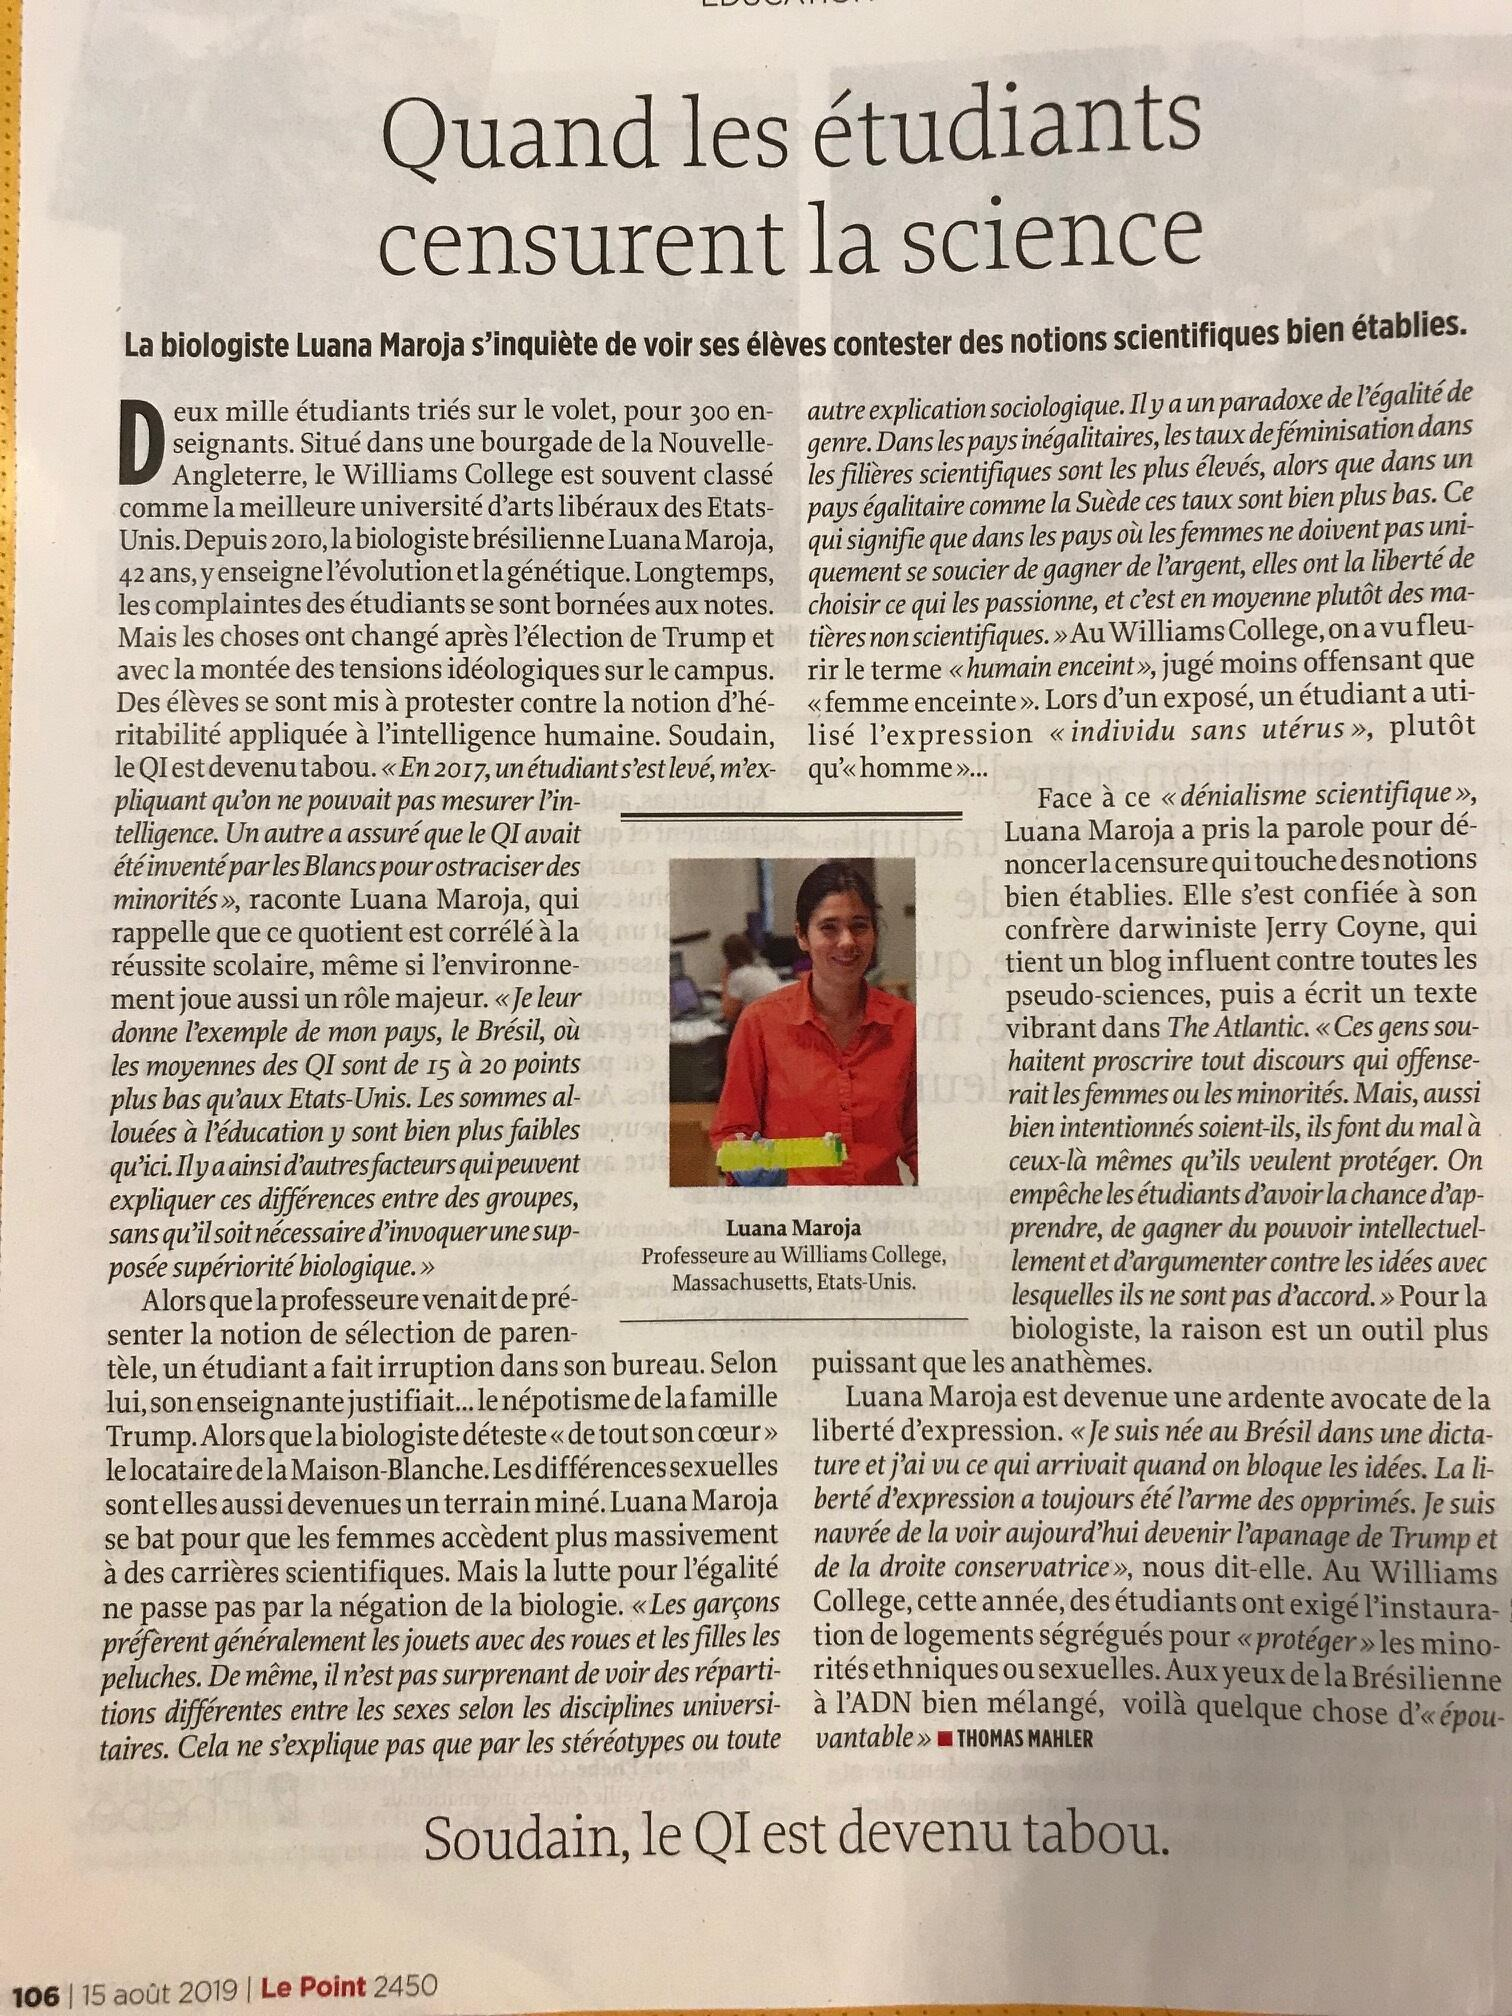 Página da revista Le Point sobre a bióloga brasileira Luana Maroja.